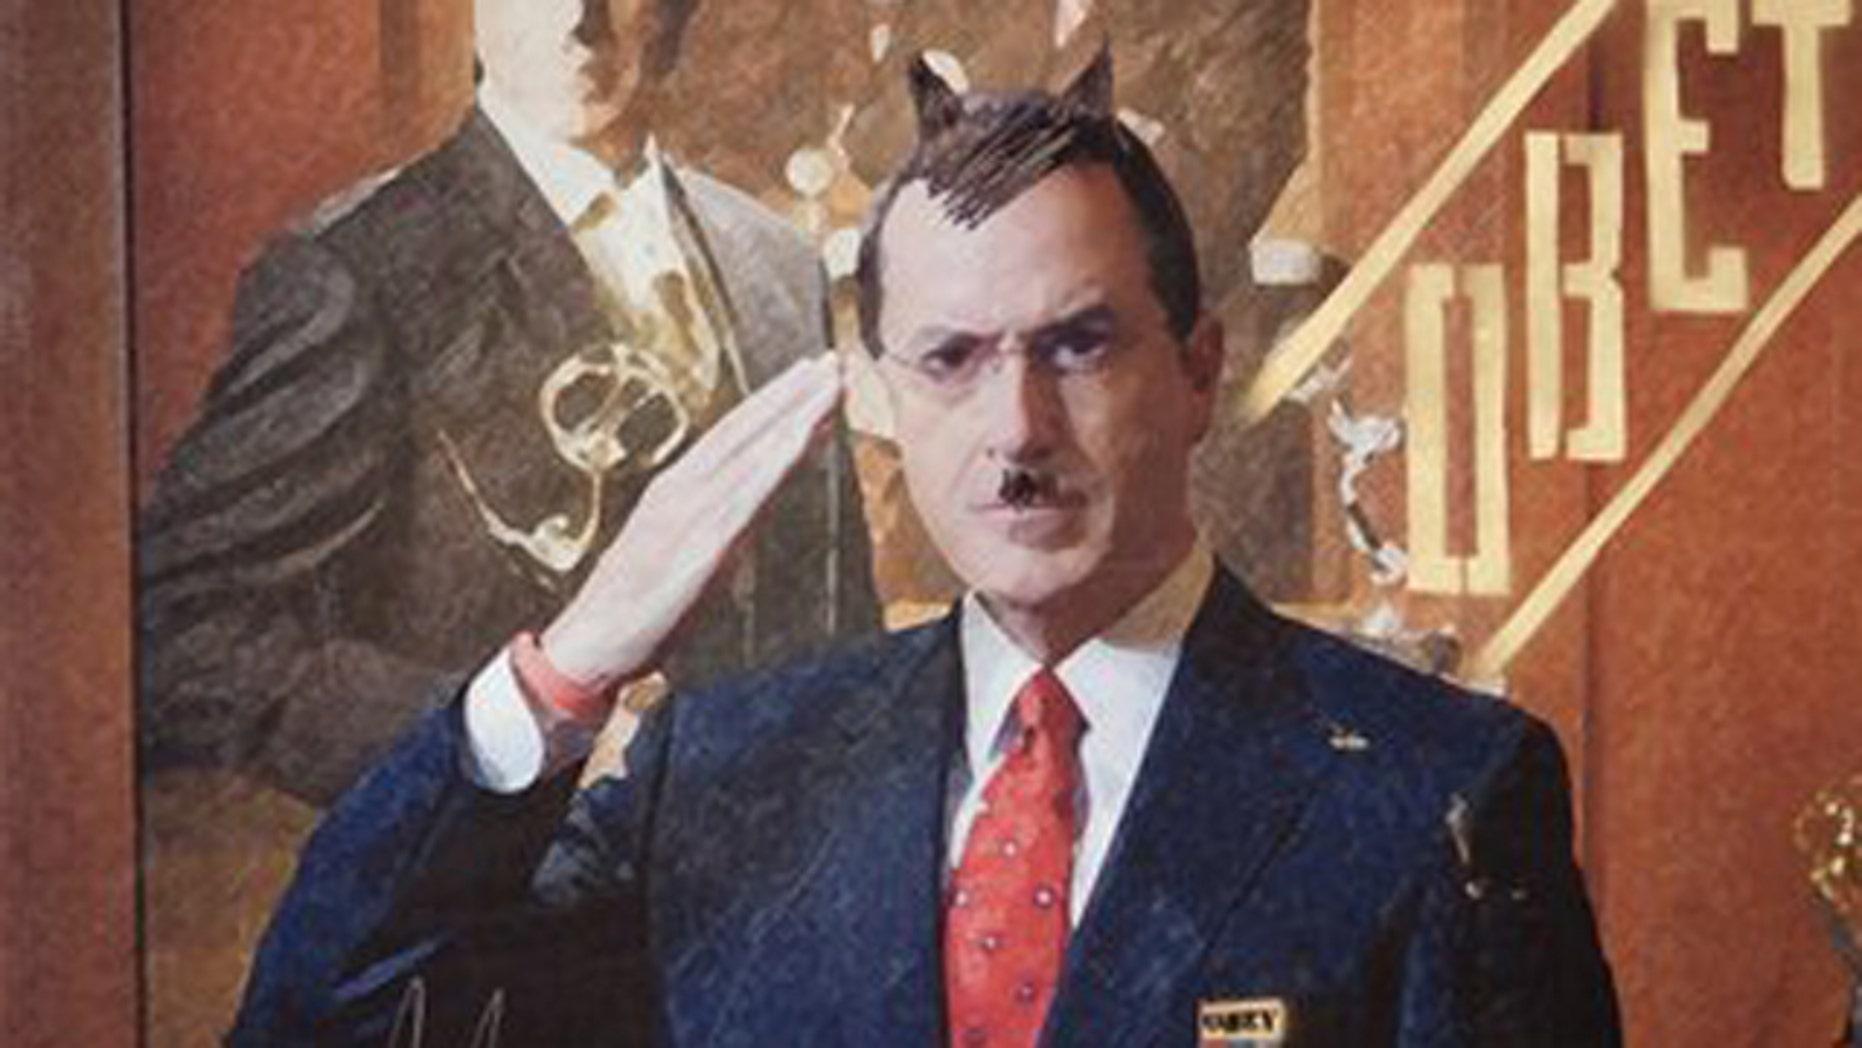 Stephen Colbert is auctioning this portrait. (AP)